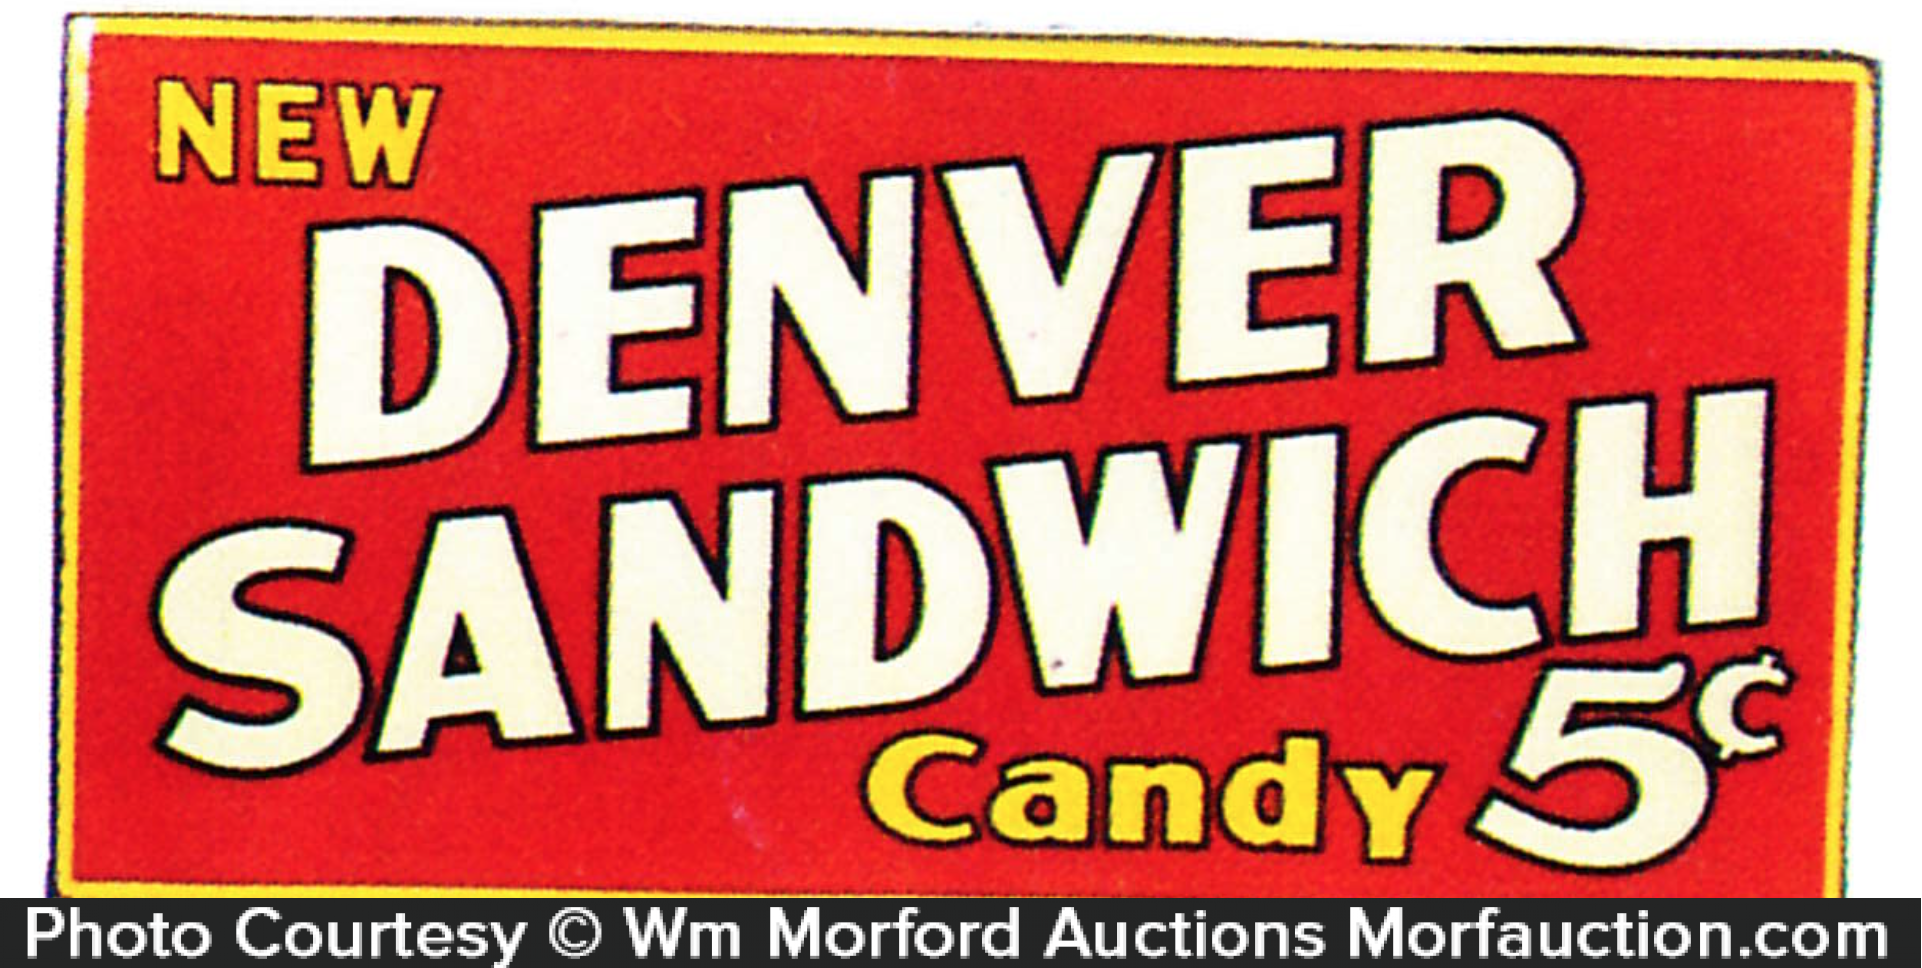 Denver Sandwich Candy Sign